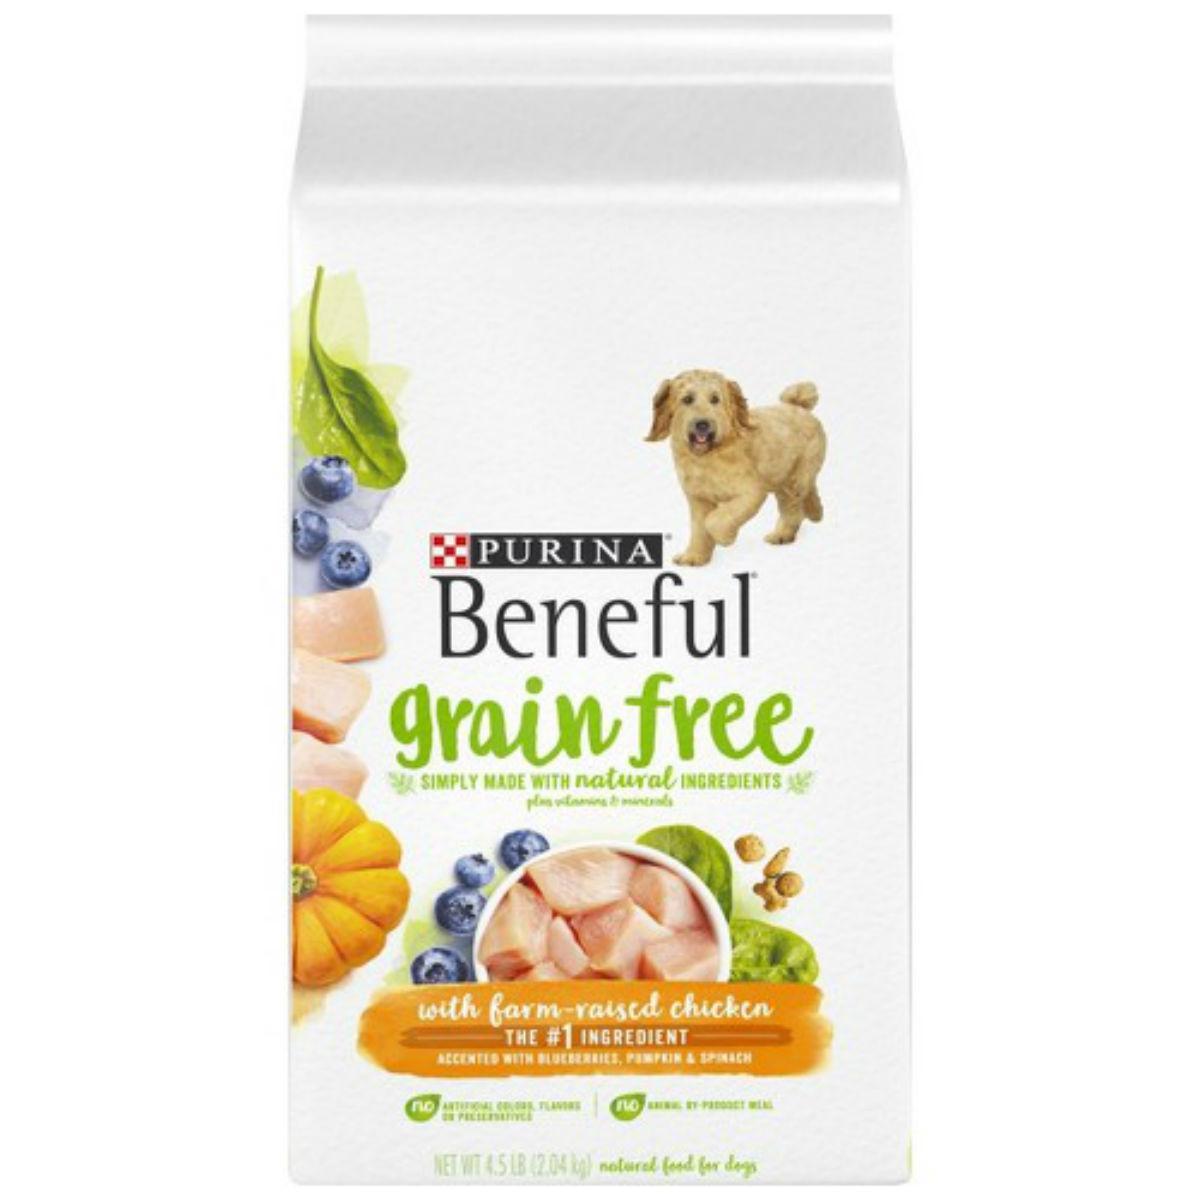 Purina Beneful Grain Free Dry Dog Food - Farm-Raised Chicken